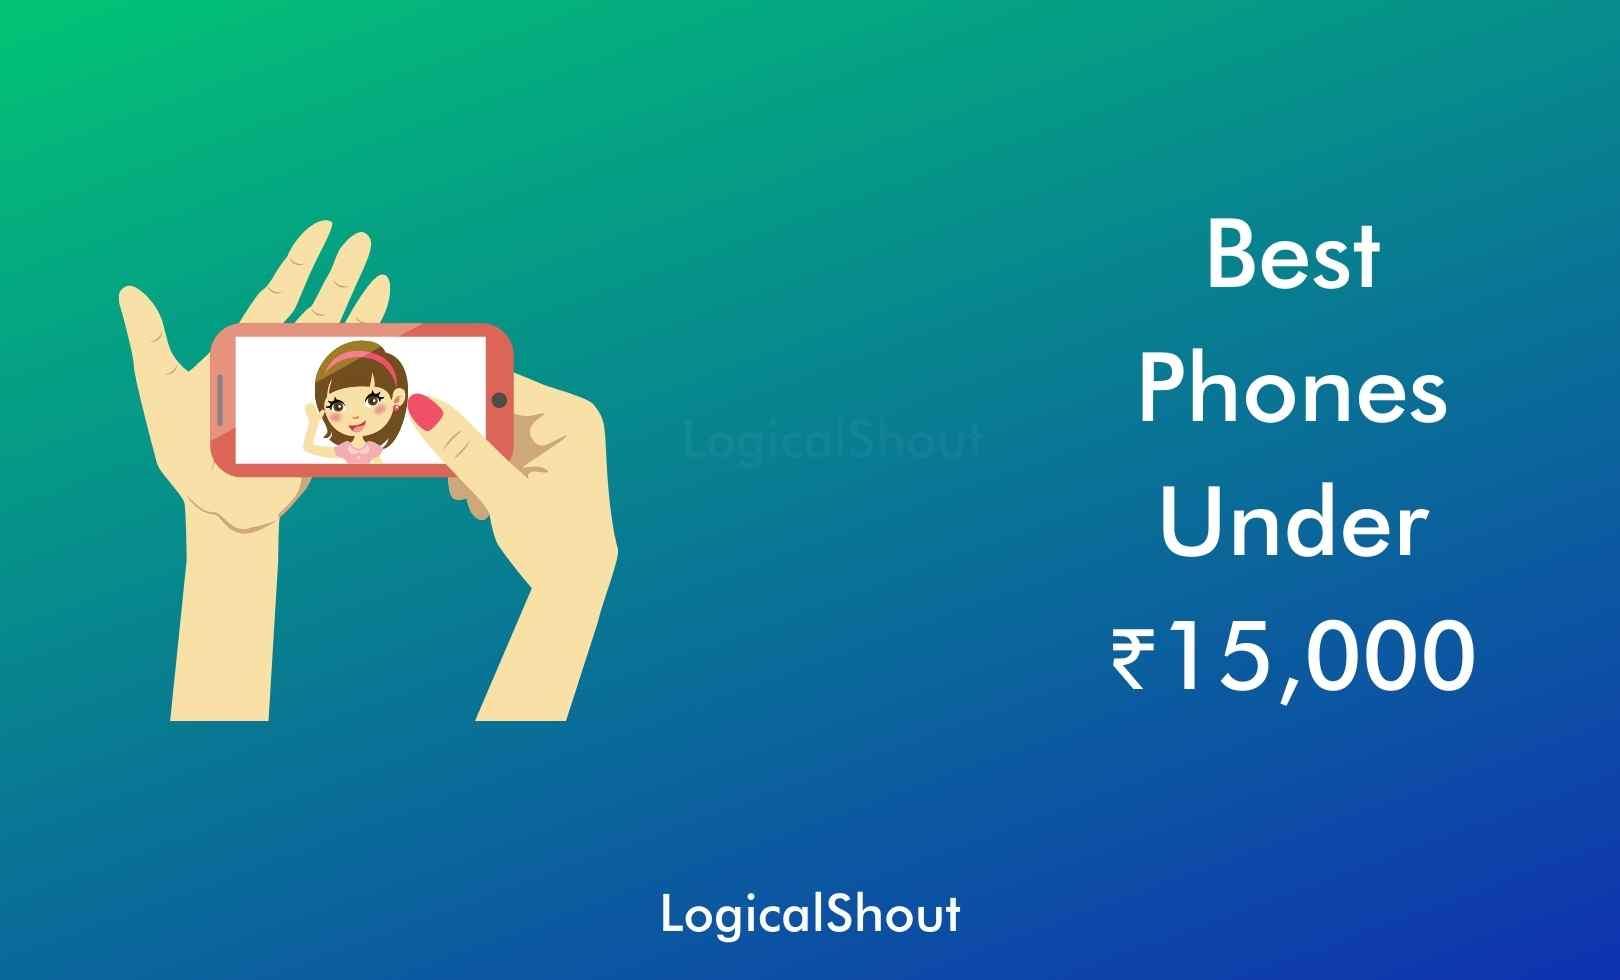 best phones under 15000 Banner